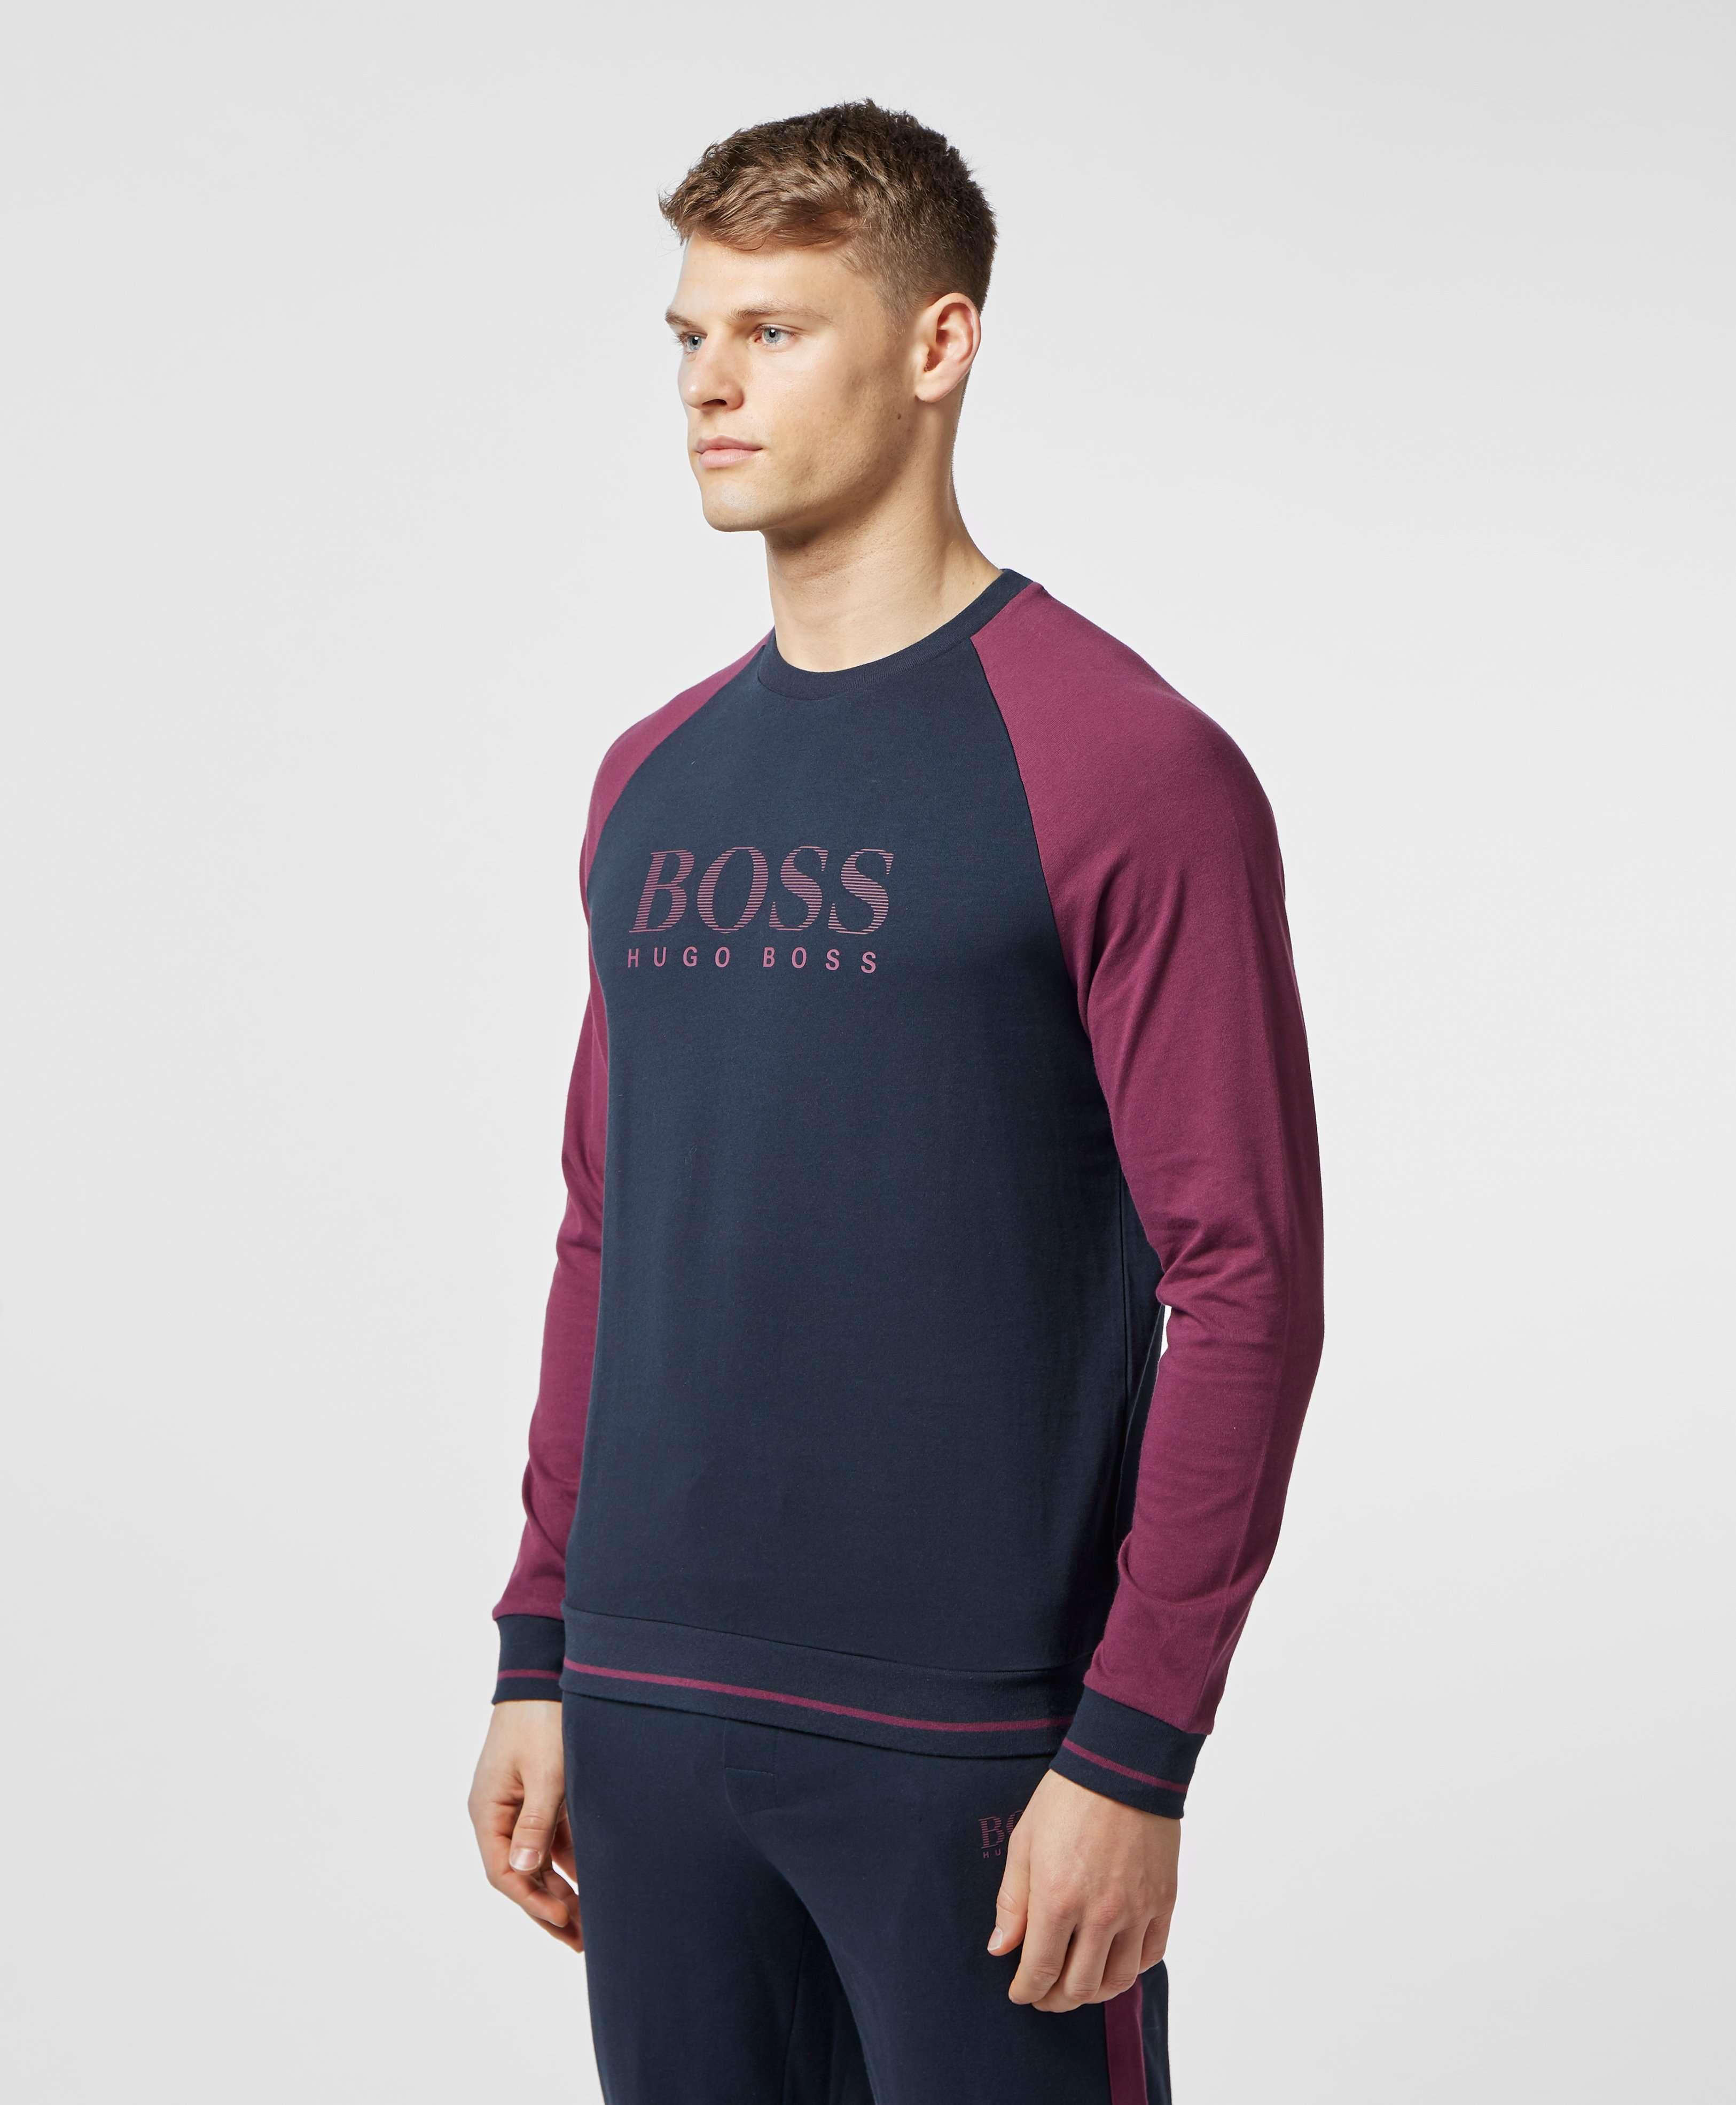 BOSS Authentic Crew Sweatshirt - Exclusive